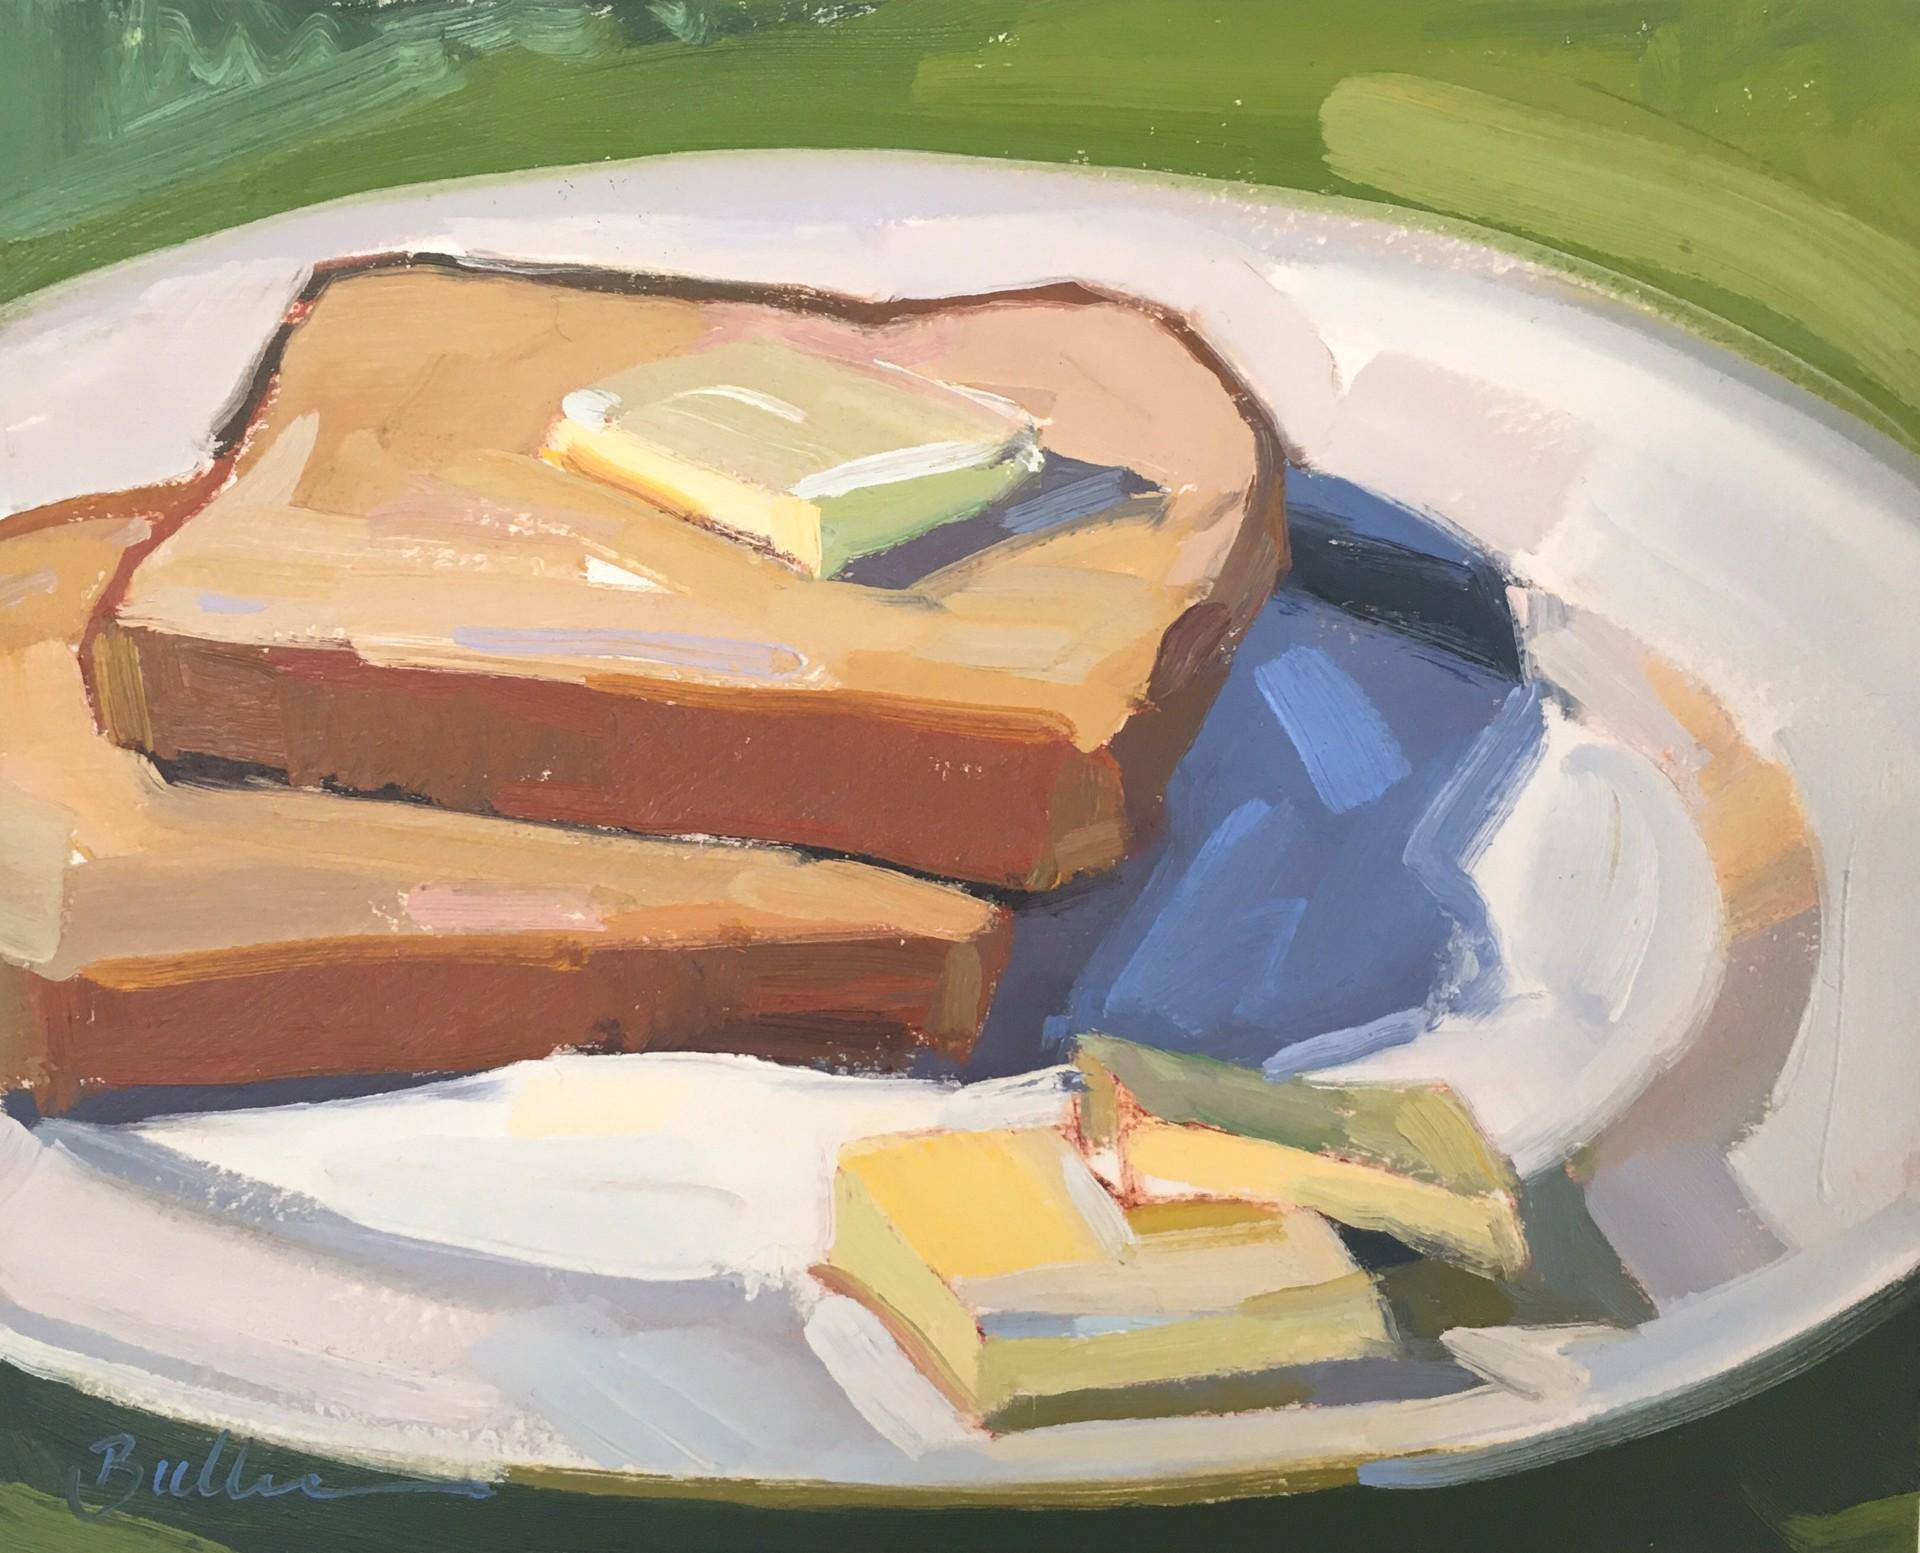 Bread Winner by Samantha Buller